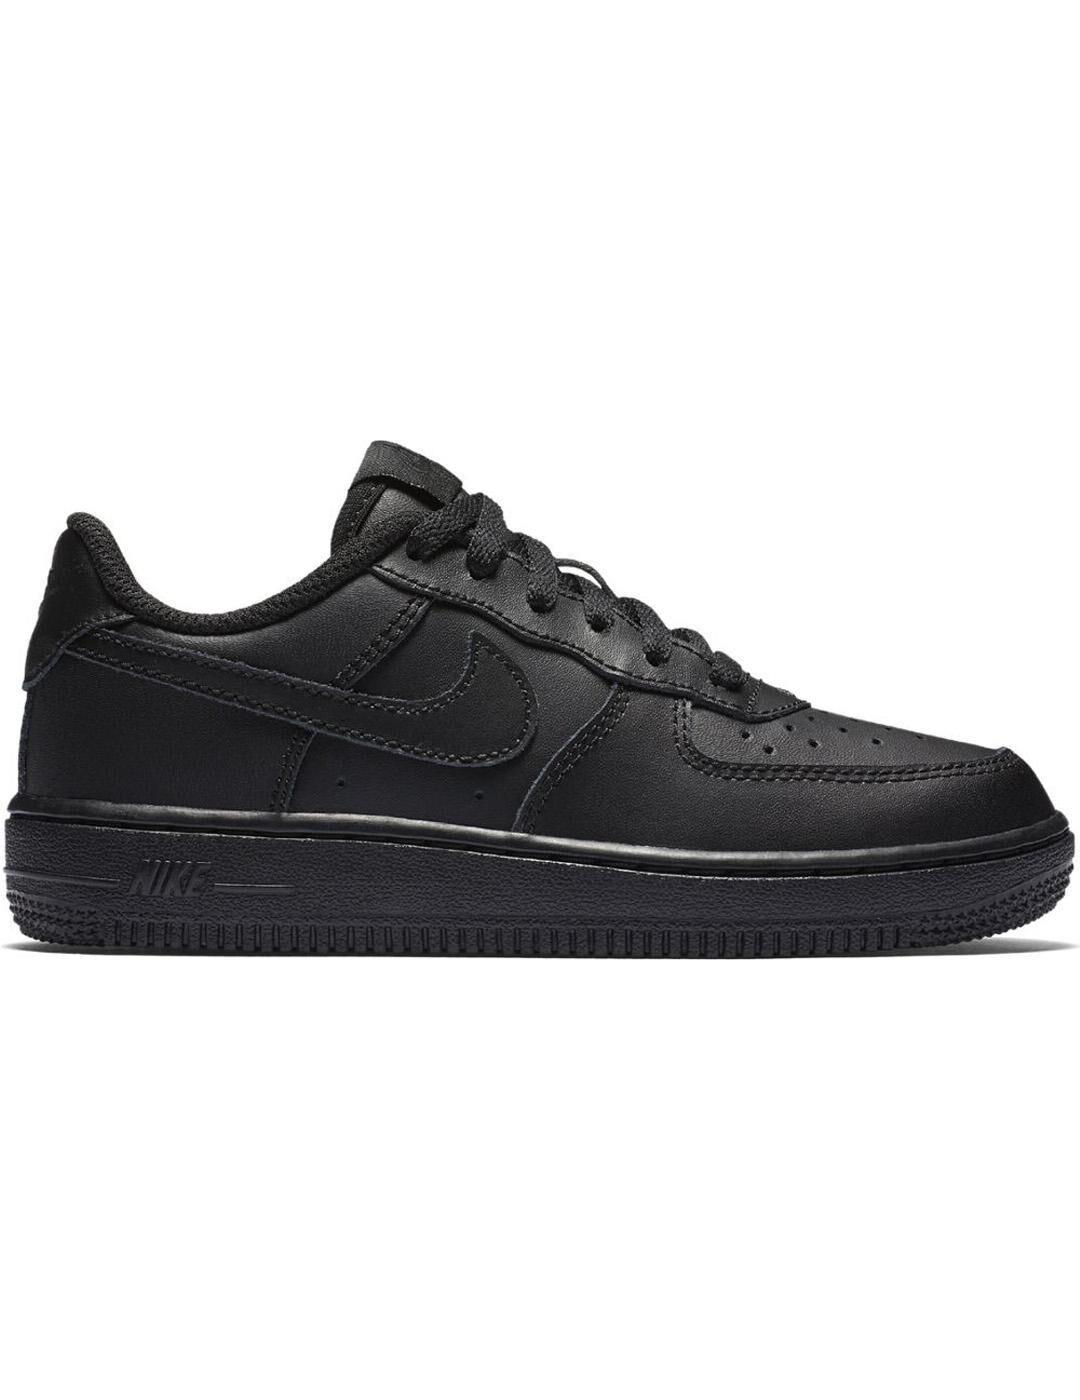 Nike Force 1 (Ps) Negro/negro Niño/a - 29,5cm